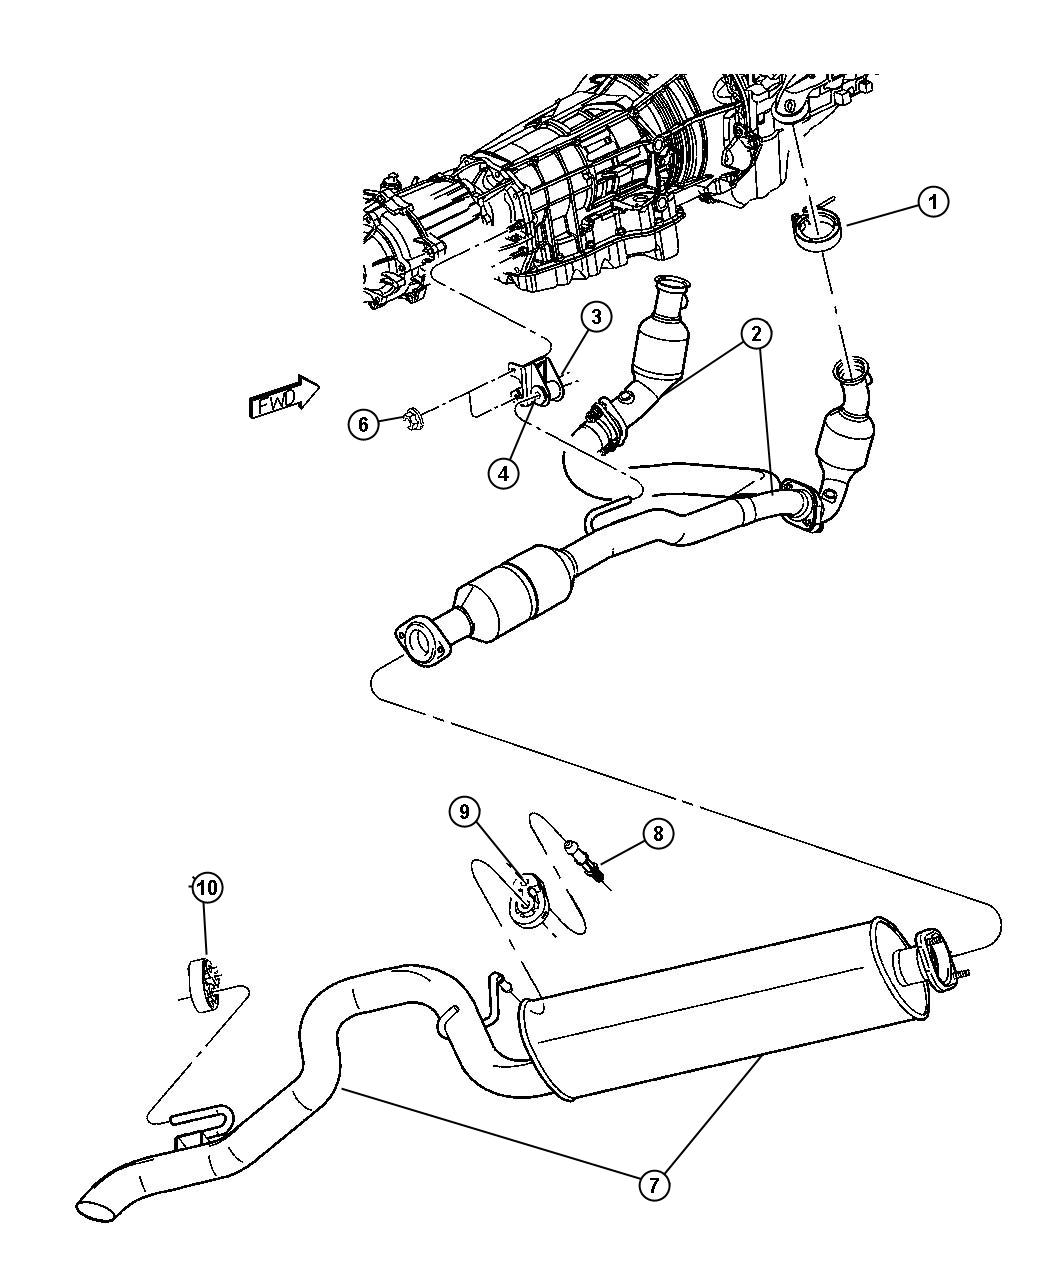 2000 daewoo leganza engine diagram  daewoo  auto wiring